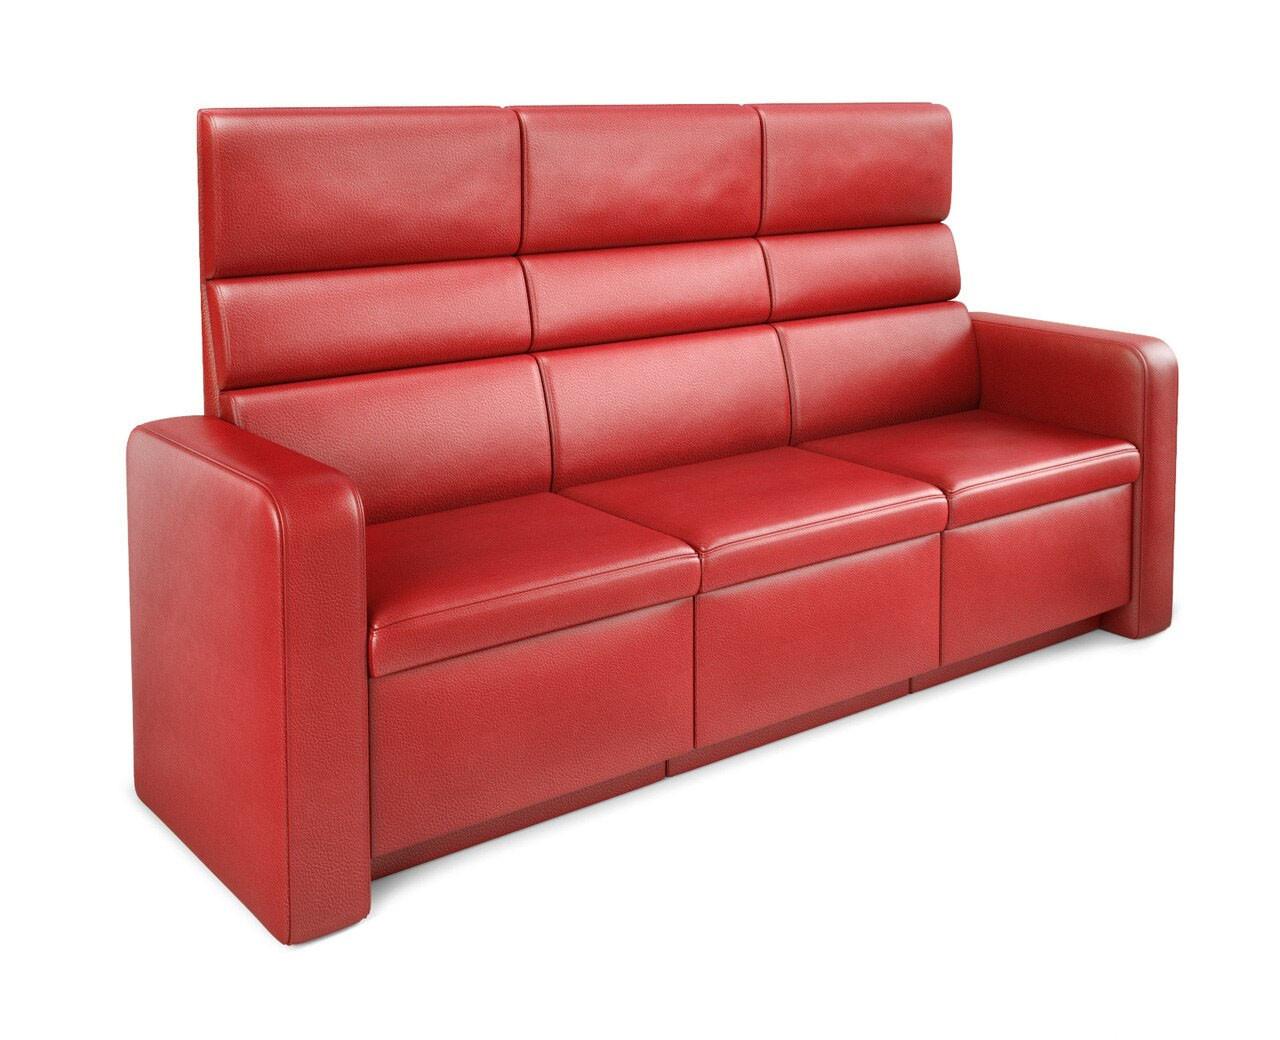 Fantastic 602 Tall Channeled Back Sofa Made In Usa Machost Co Dining Chair Design Ideas Machostcouk